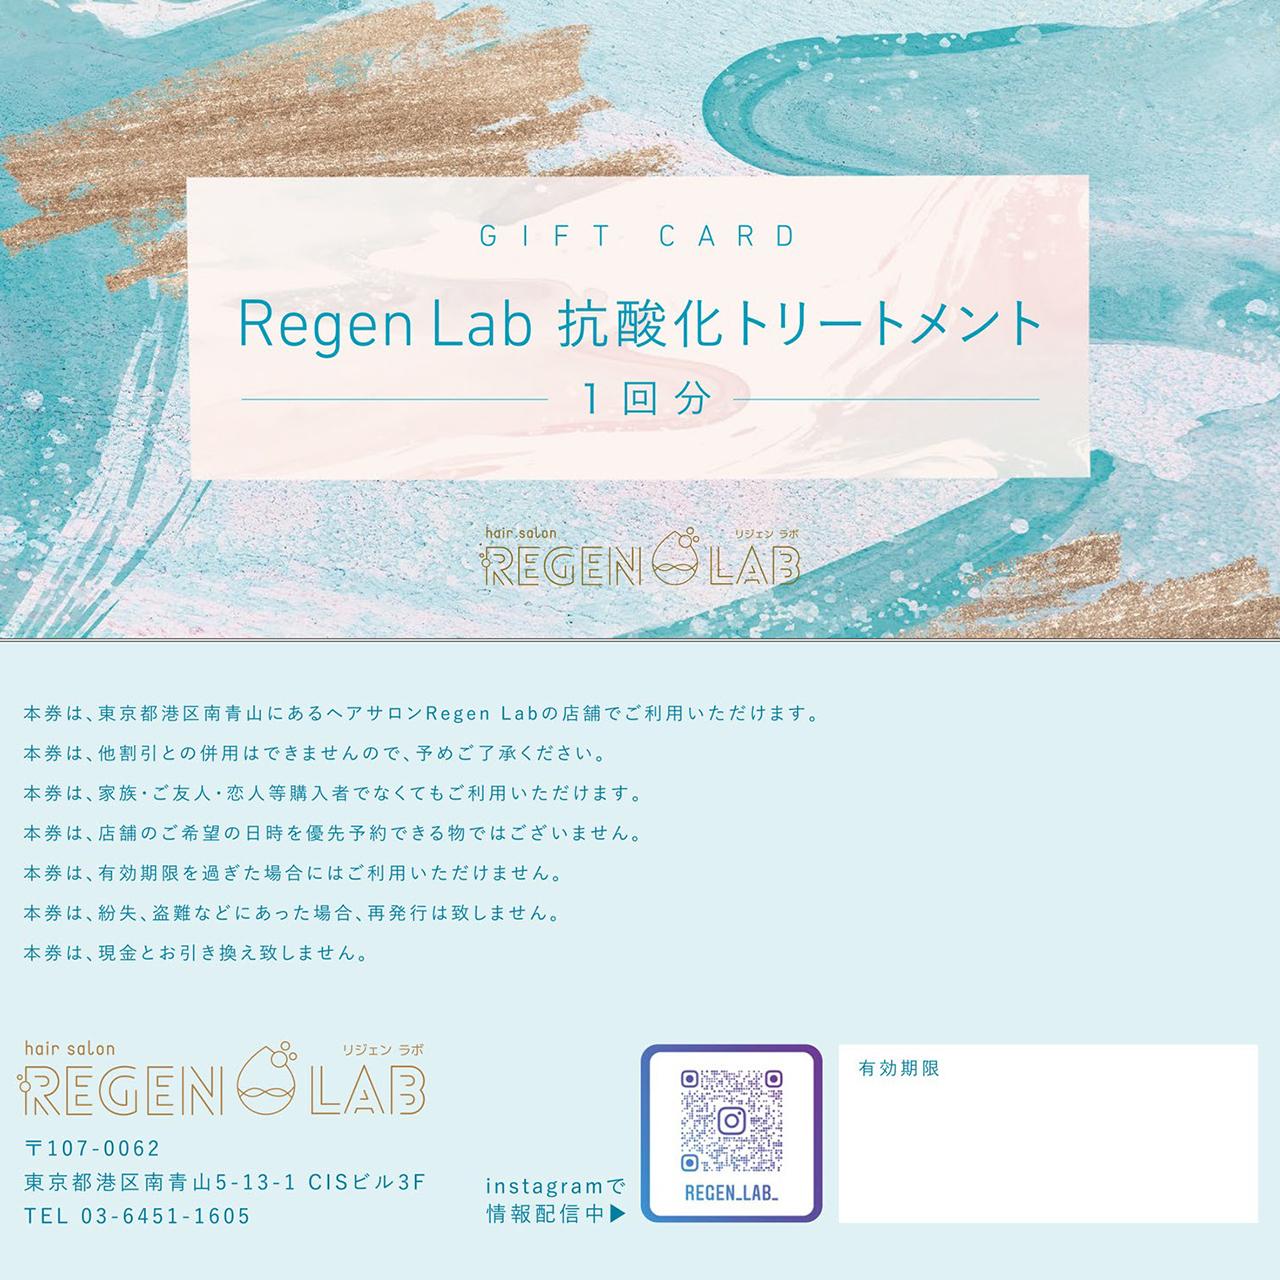 【Gift Card】Regen Lab 抗酸化トリートメント[1回分]